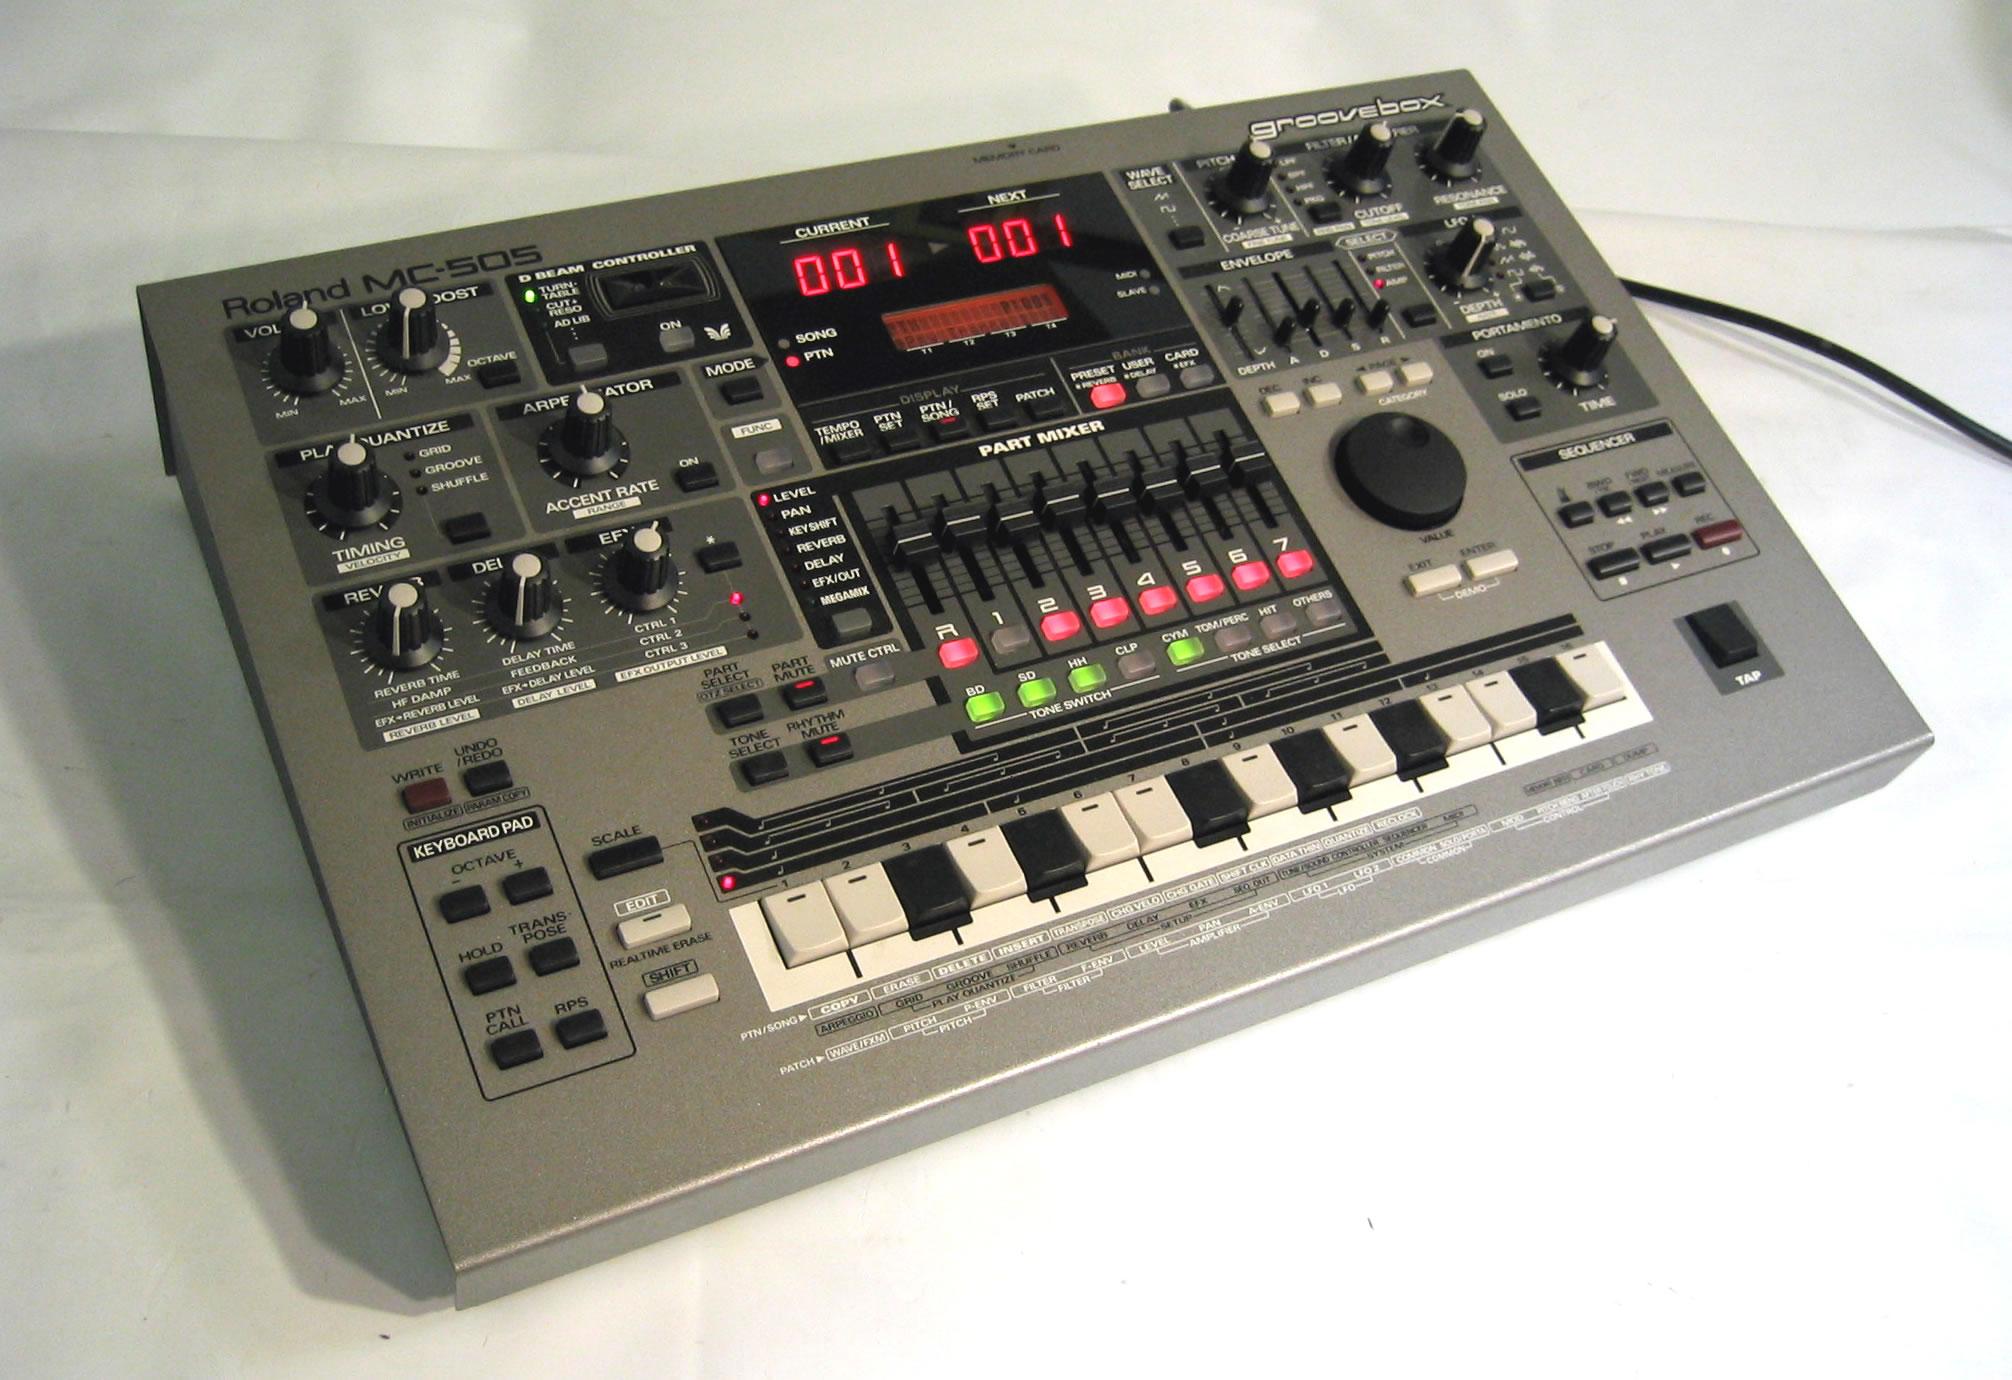 Roland MC-505 - Wikipedia